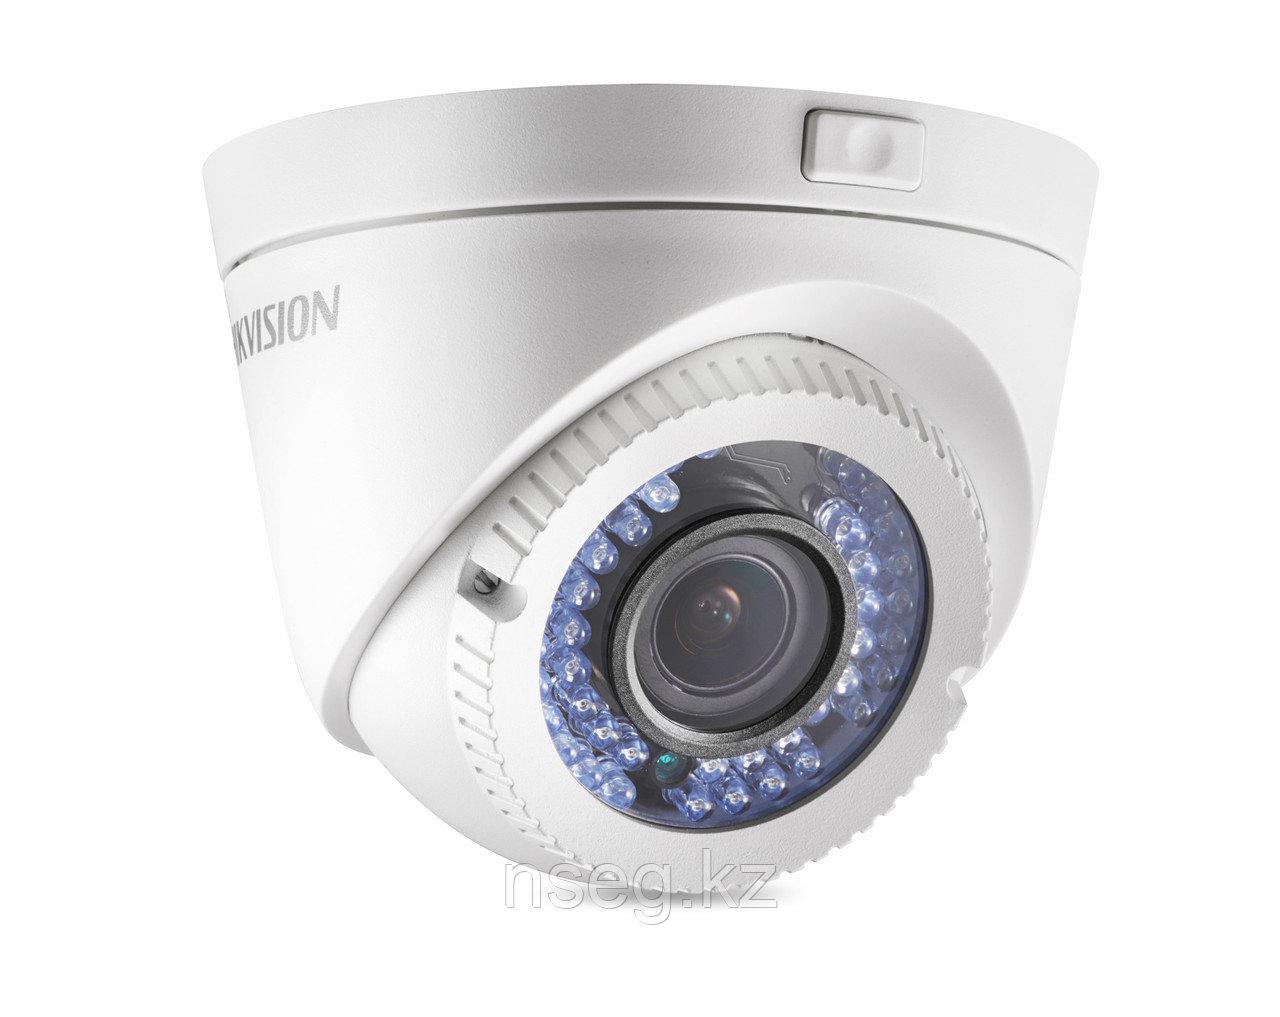 HIKVISION DS-2CE56D1T-VFIR3 купольные HD камеры